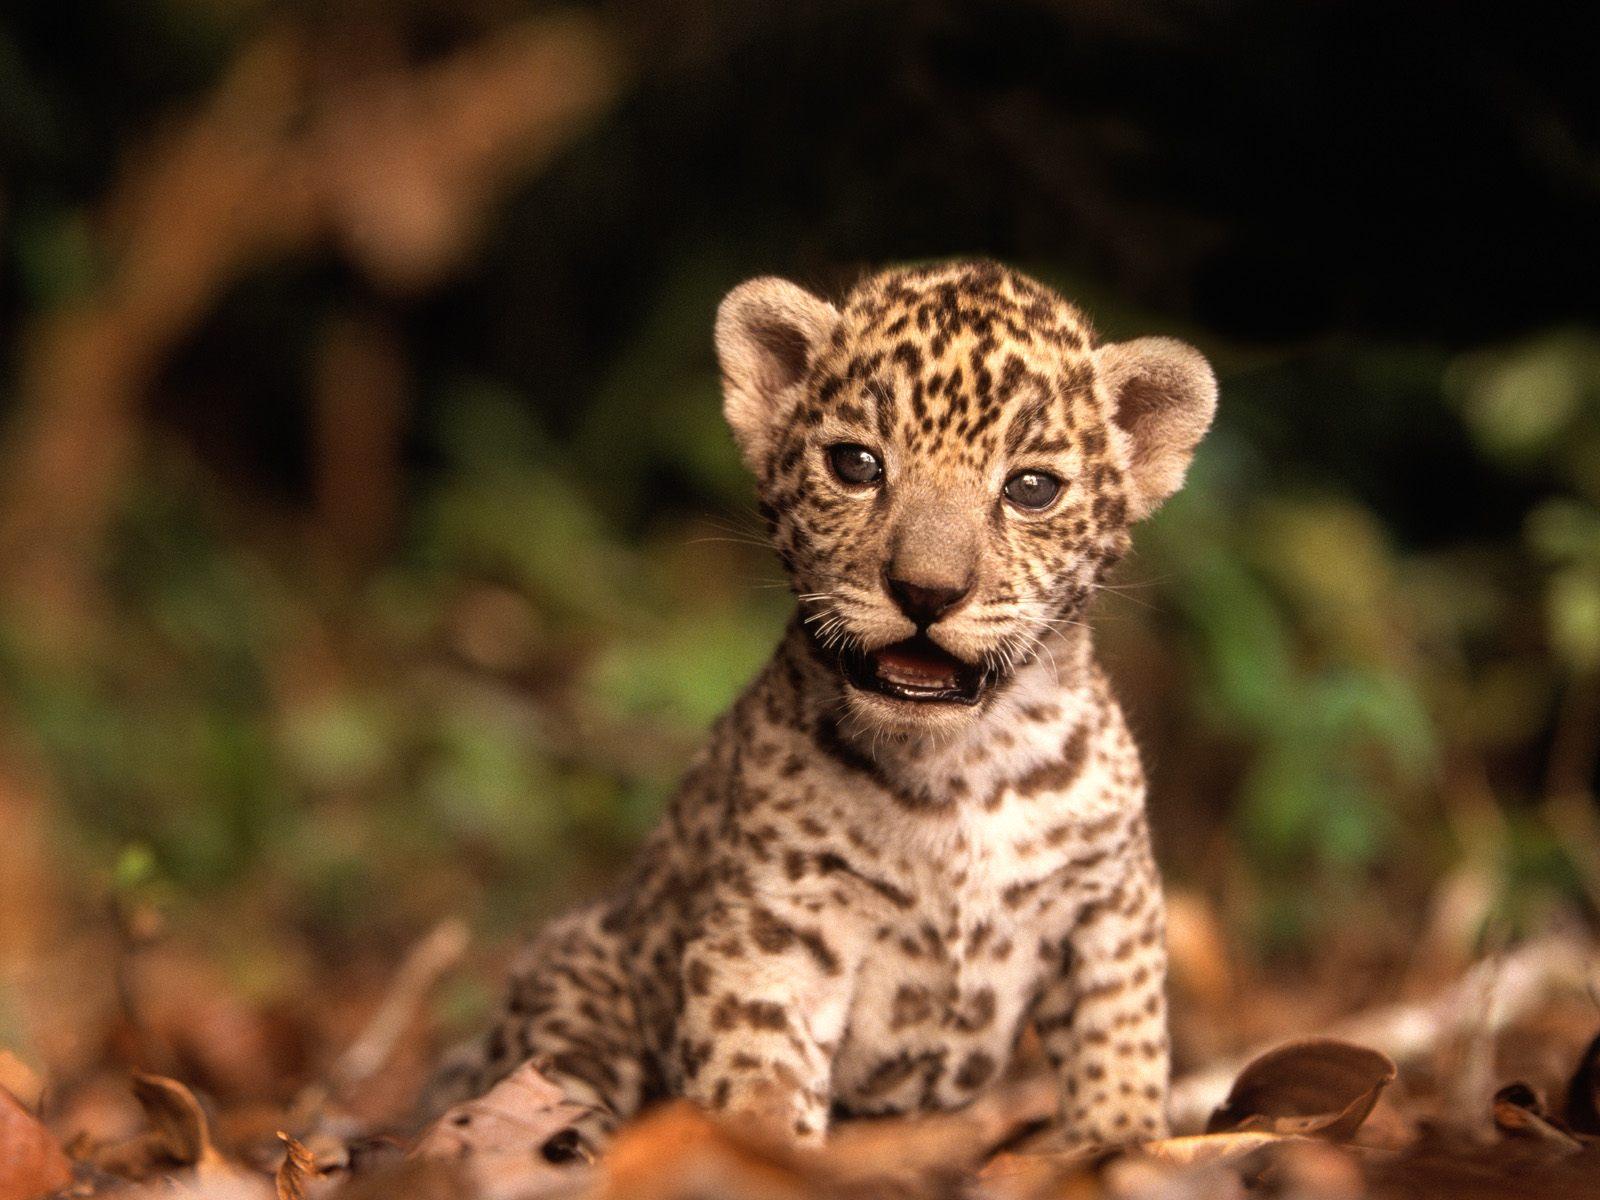 HD Jaguar Wallpapers | Desktop Wallpapers